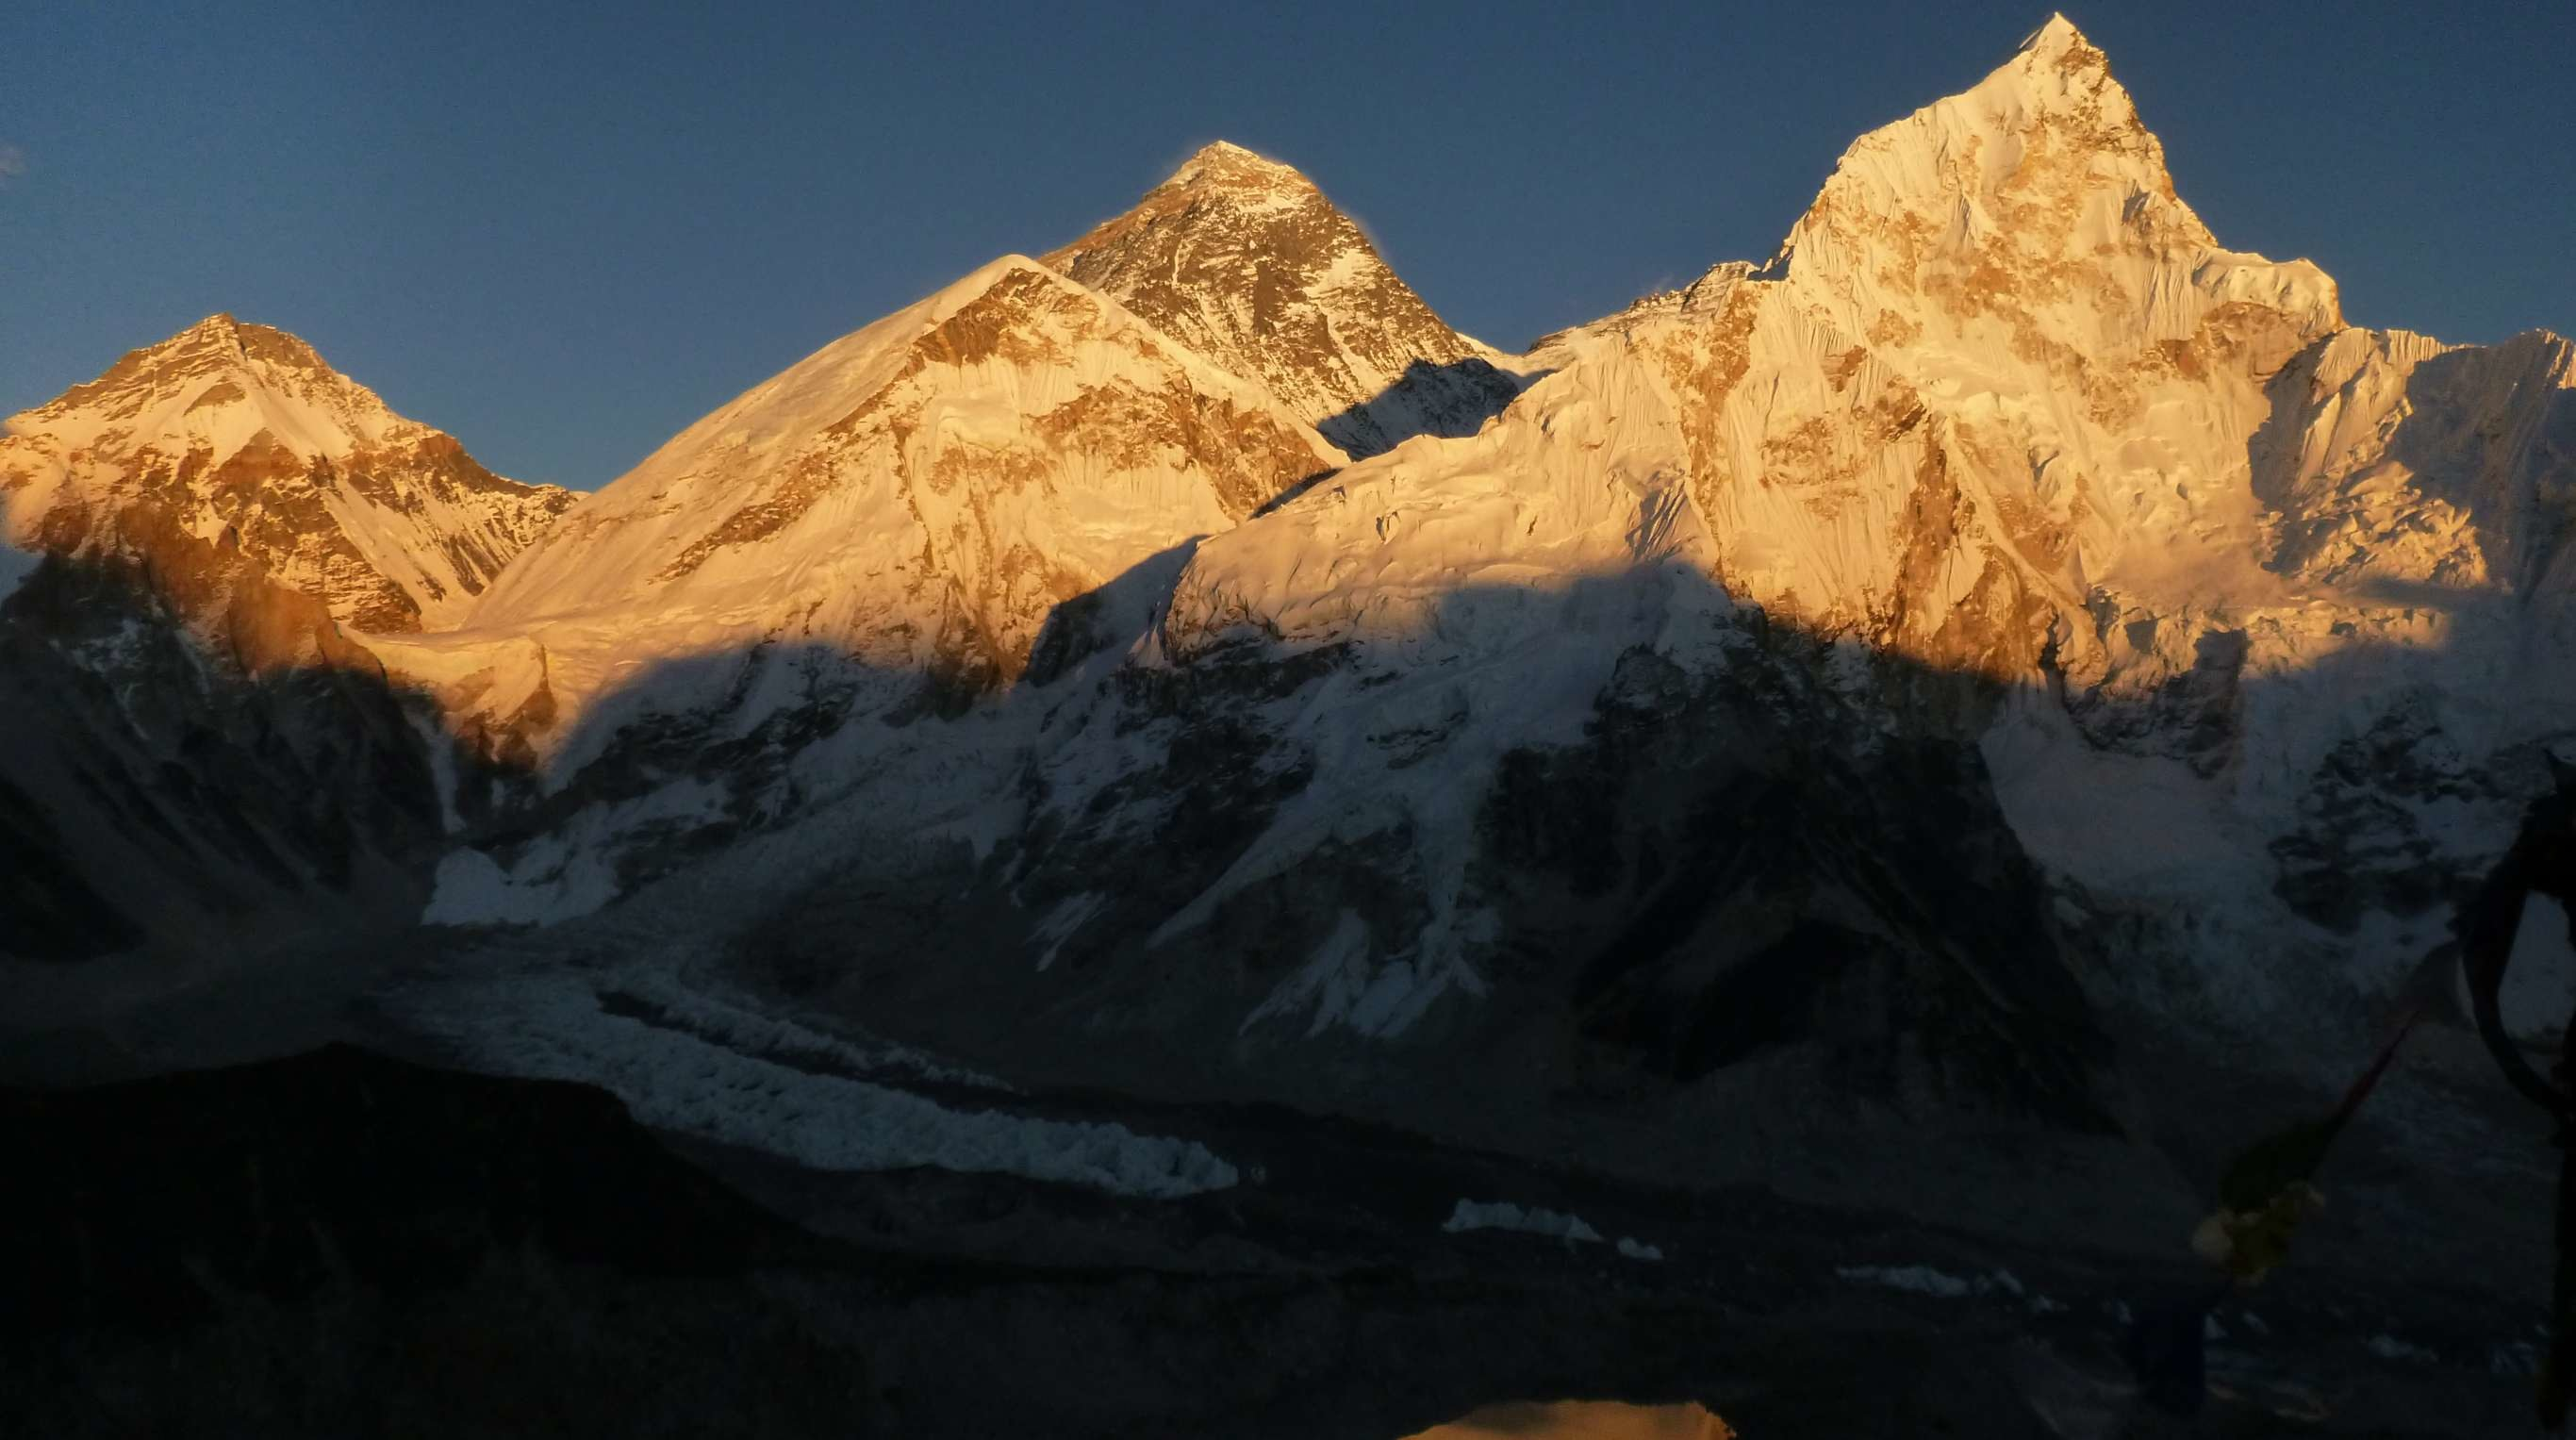 15-Day Everest Base Camp Trekking - Nepal Itinerary